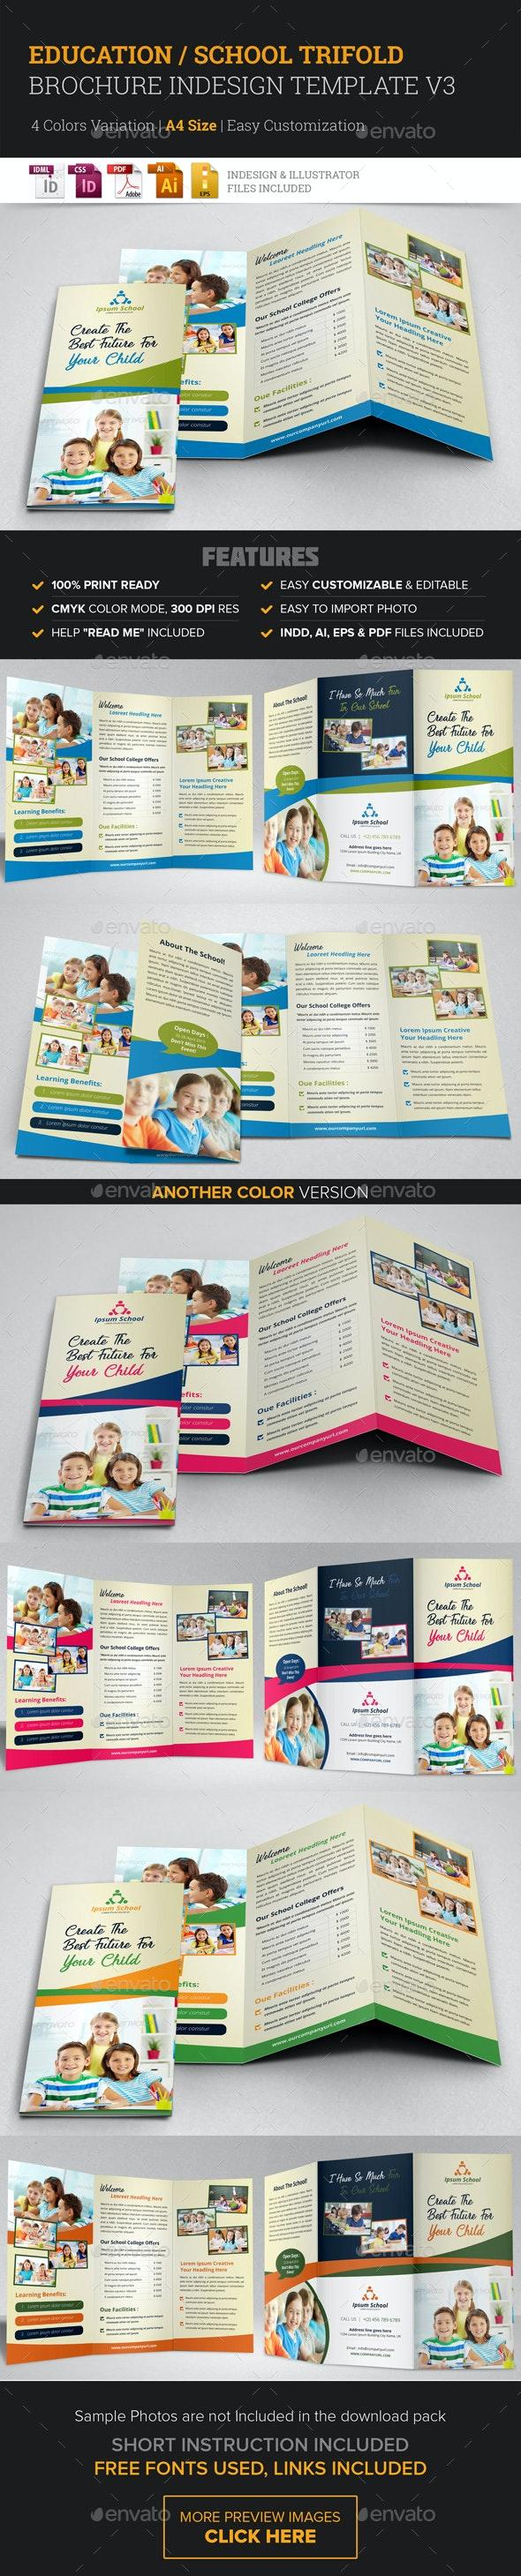 Education School Trifold Brochure v3 - Corporate Brochures